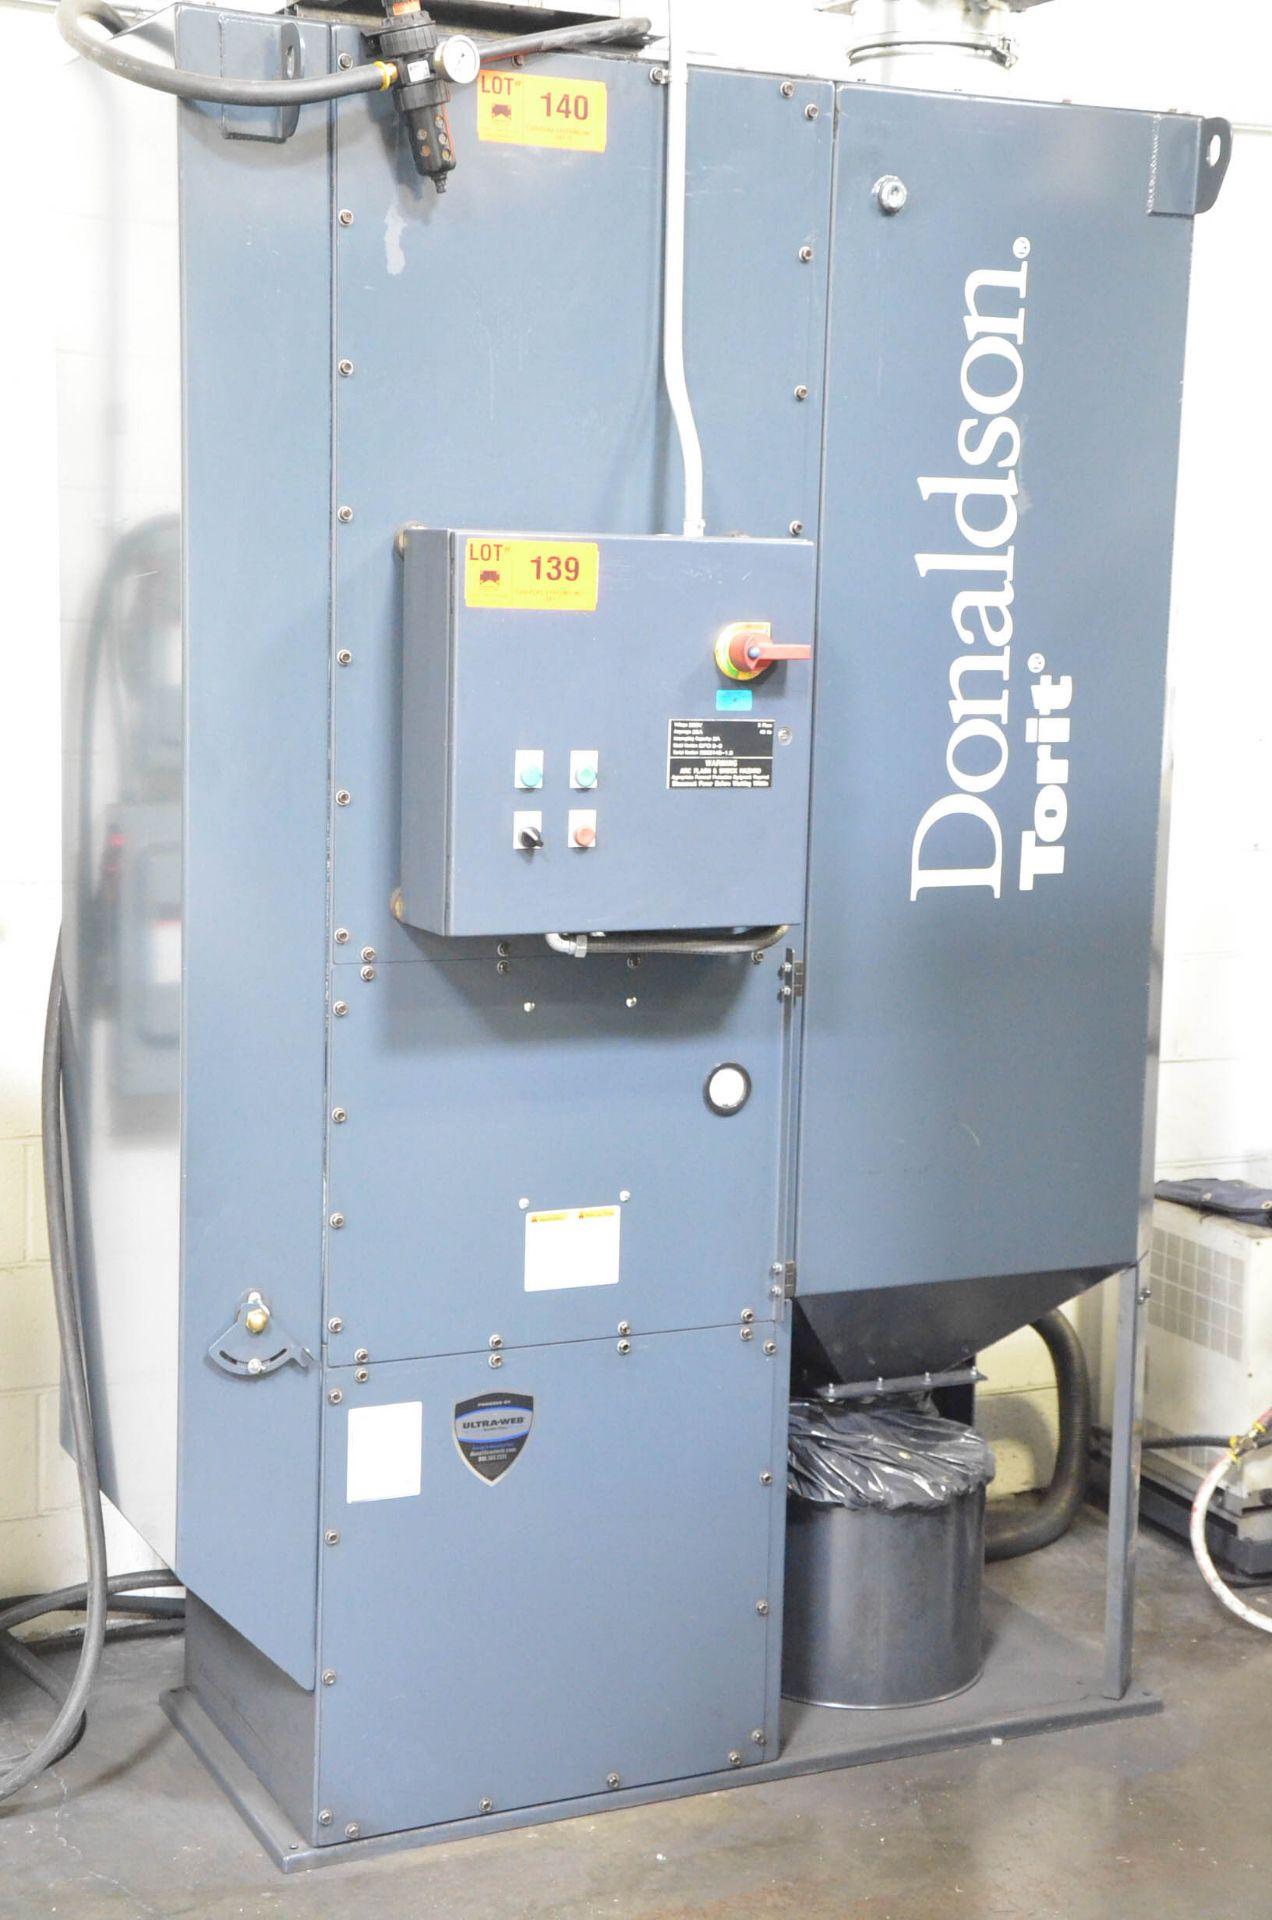 DONALDSON TORIT DFO3-3 CARTRIDGE-TYPE DUST COLLECTOR, 208V/3PH/60HZ, S/N 3825145-1.3 (CI) [RIGGING